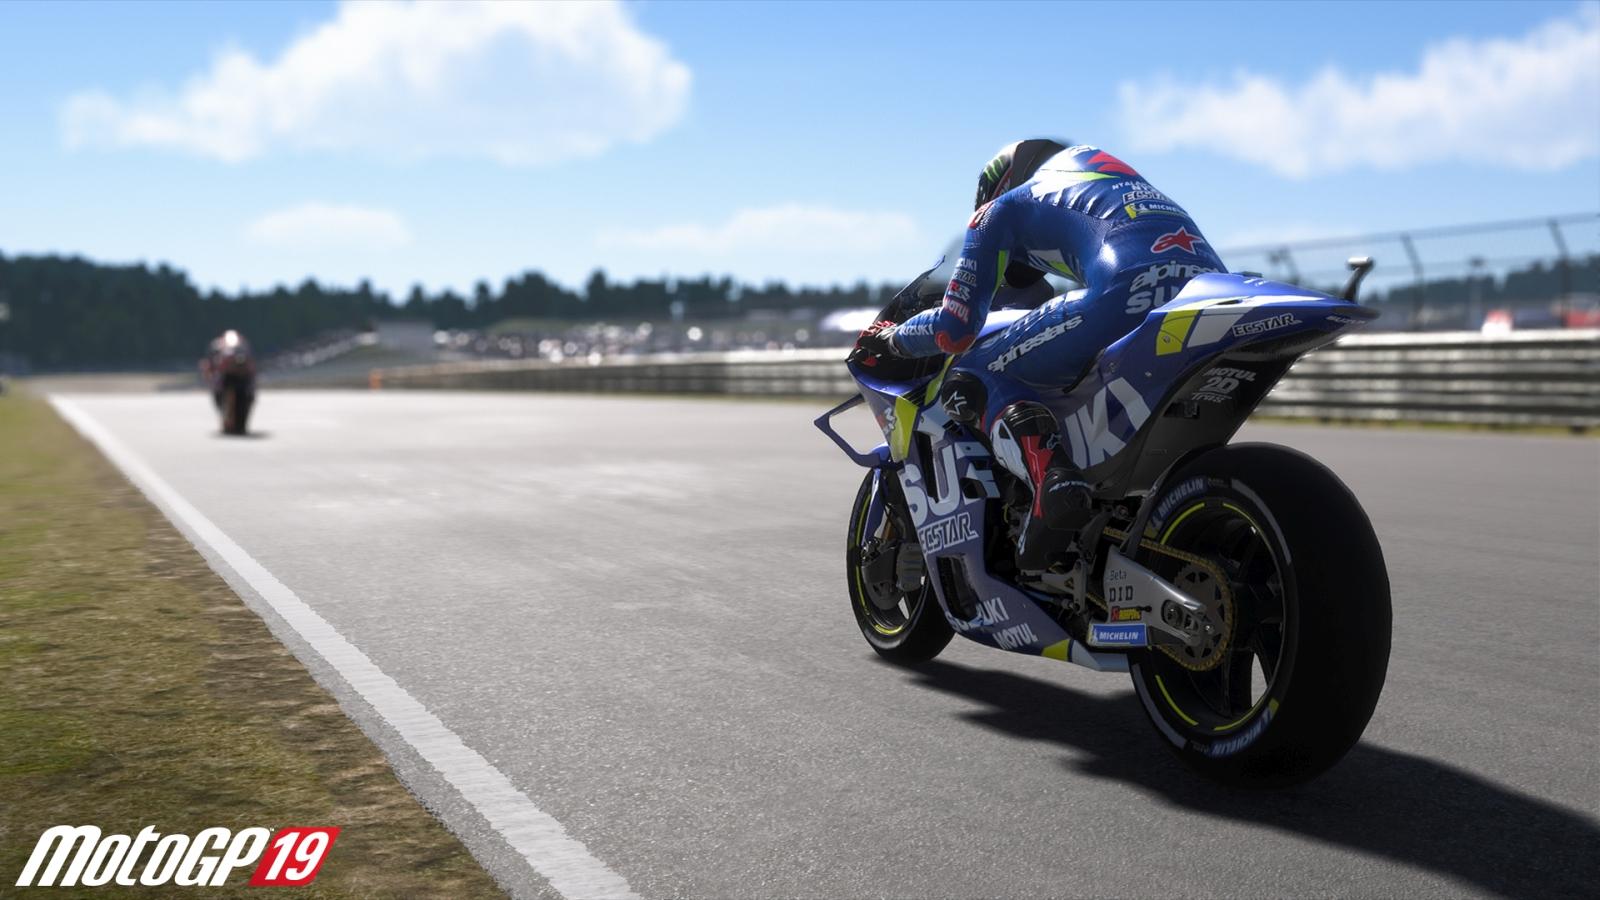 MotoGP 19 Gamereview